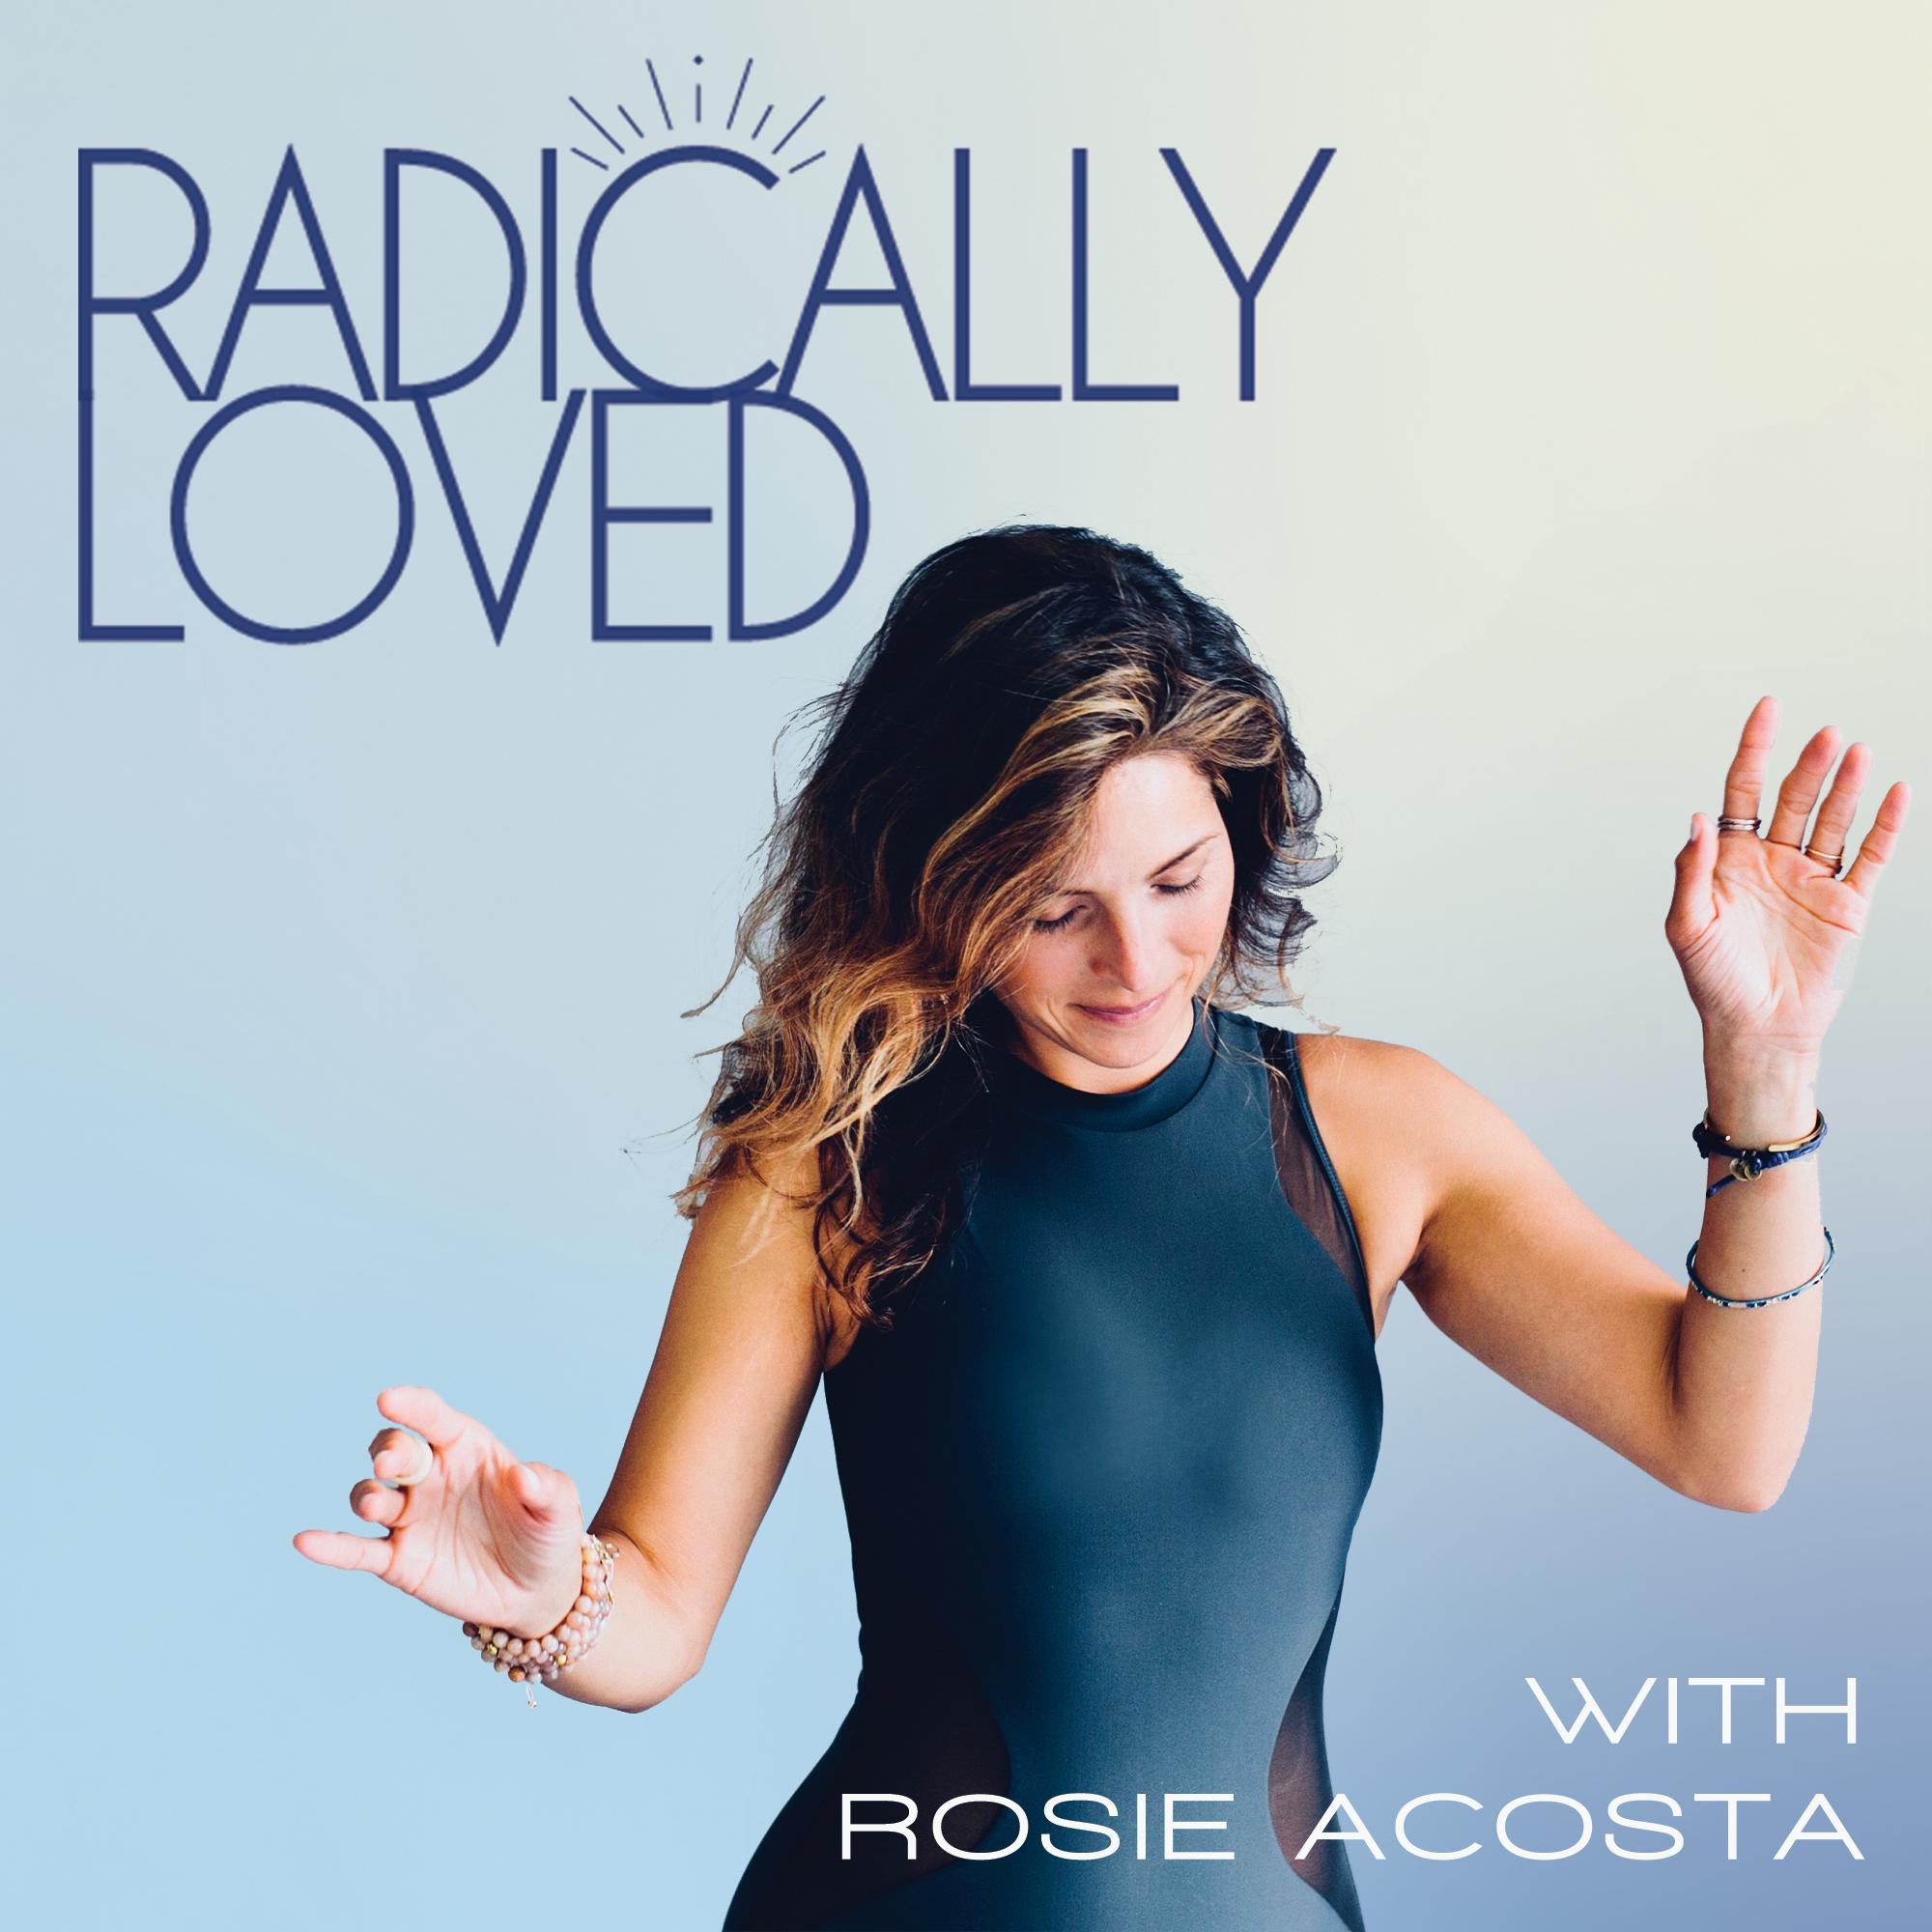 Radically Loved Radio with Rosie Acosta show art